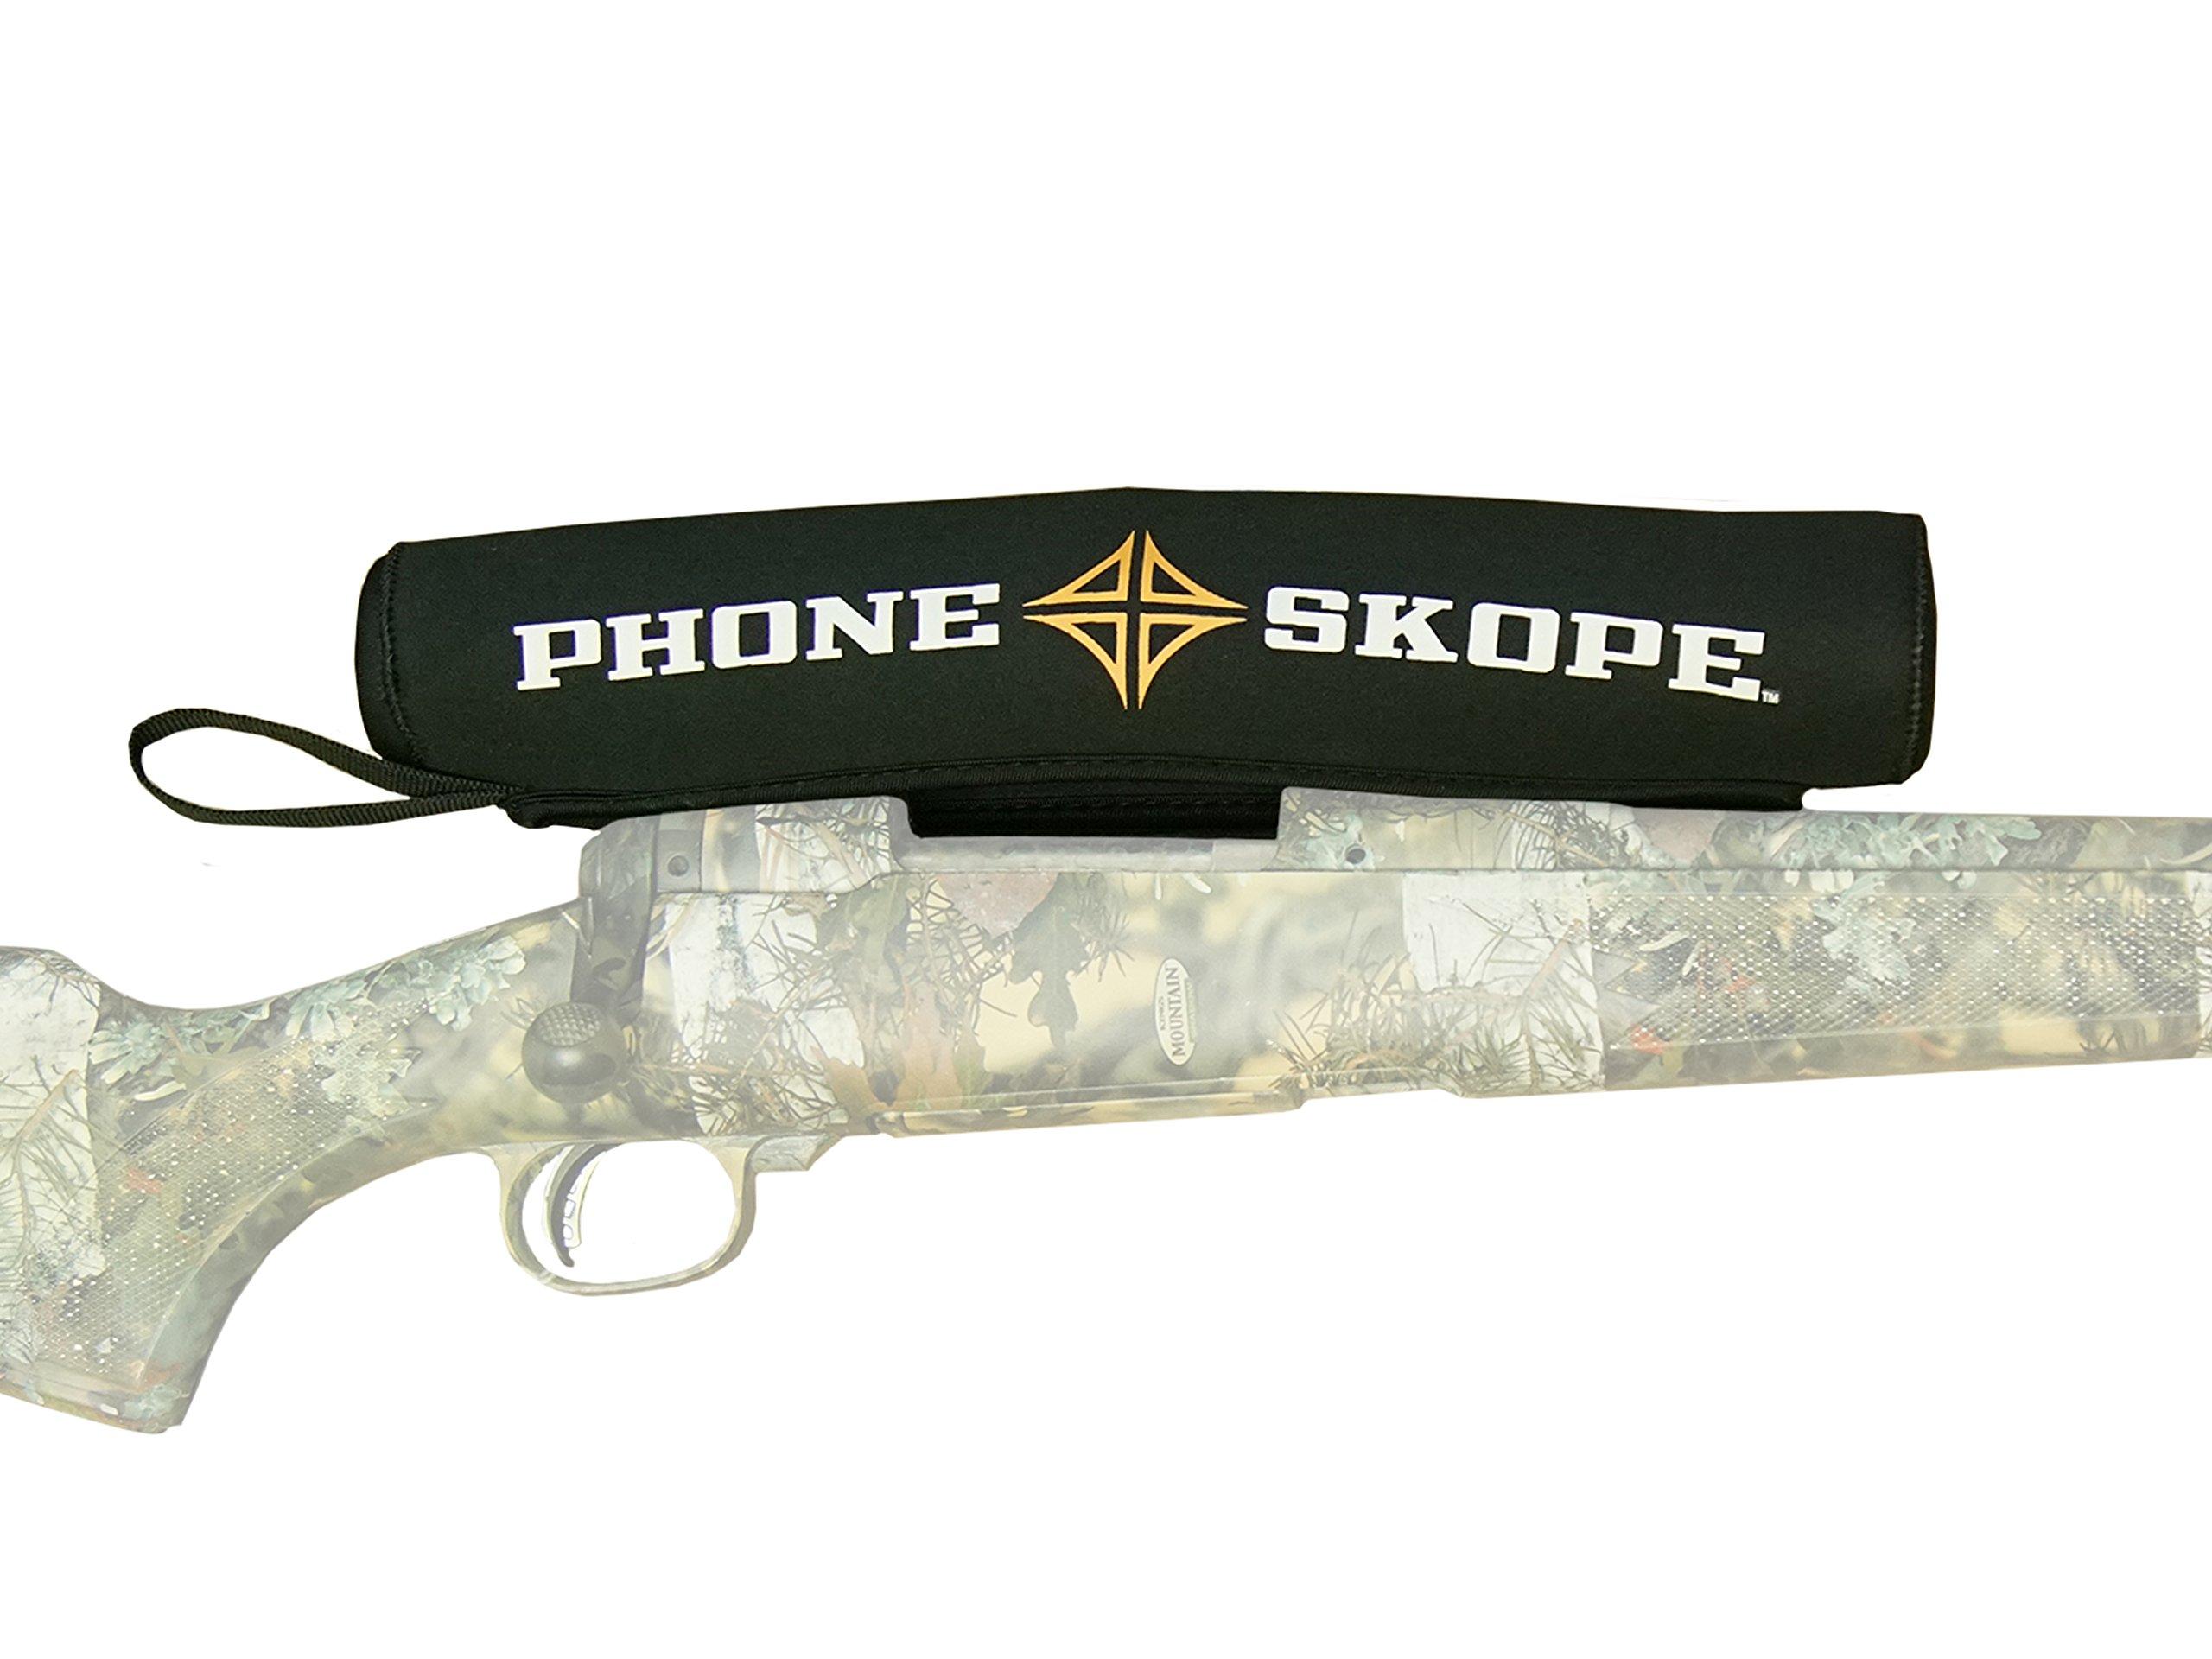 Phone Skope Neoprene Rifle Scope Cover Easy On Easy Off 17''-21'' (Large) by Phone Skope